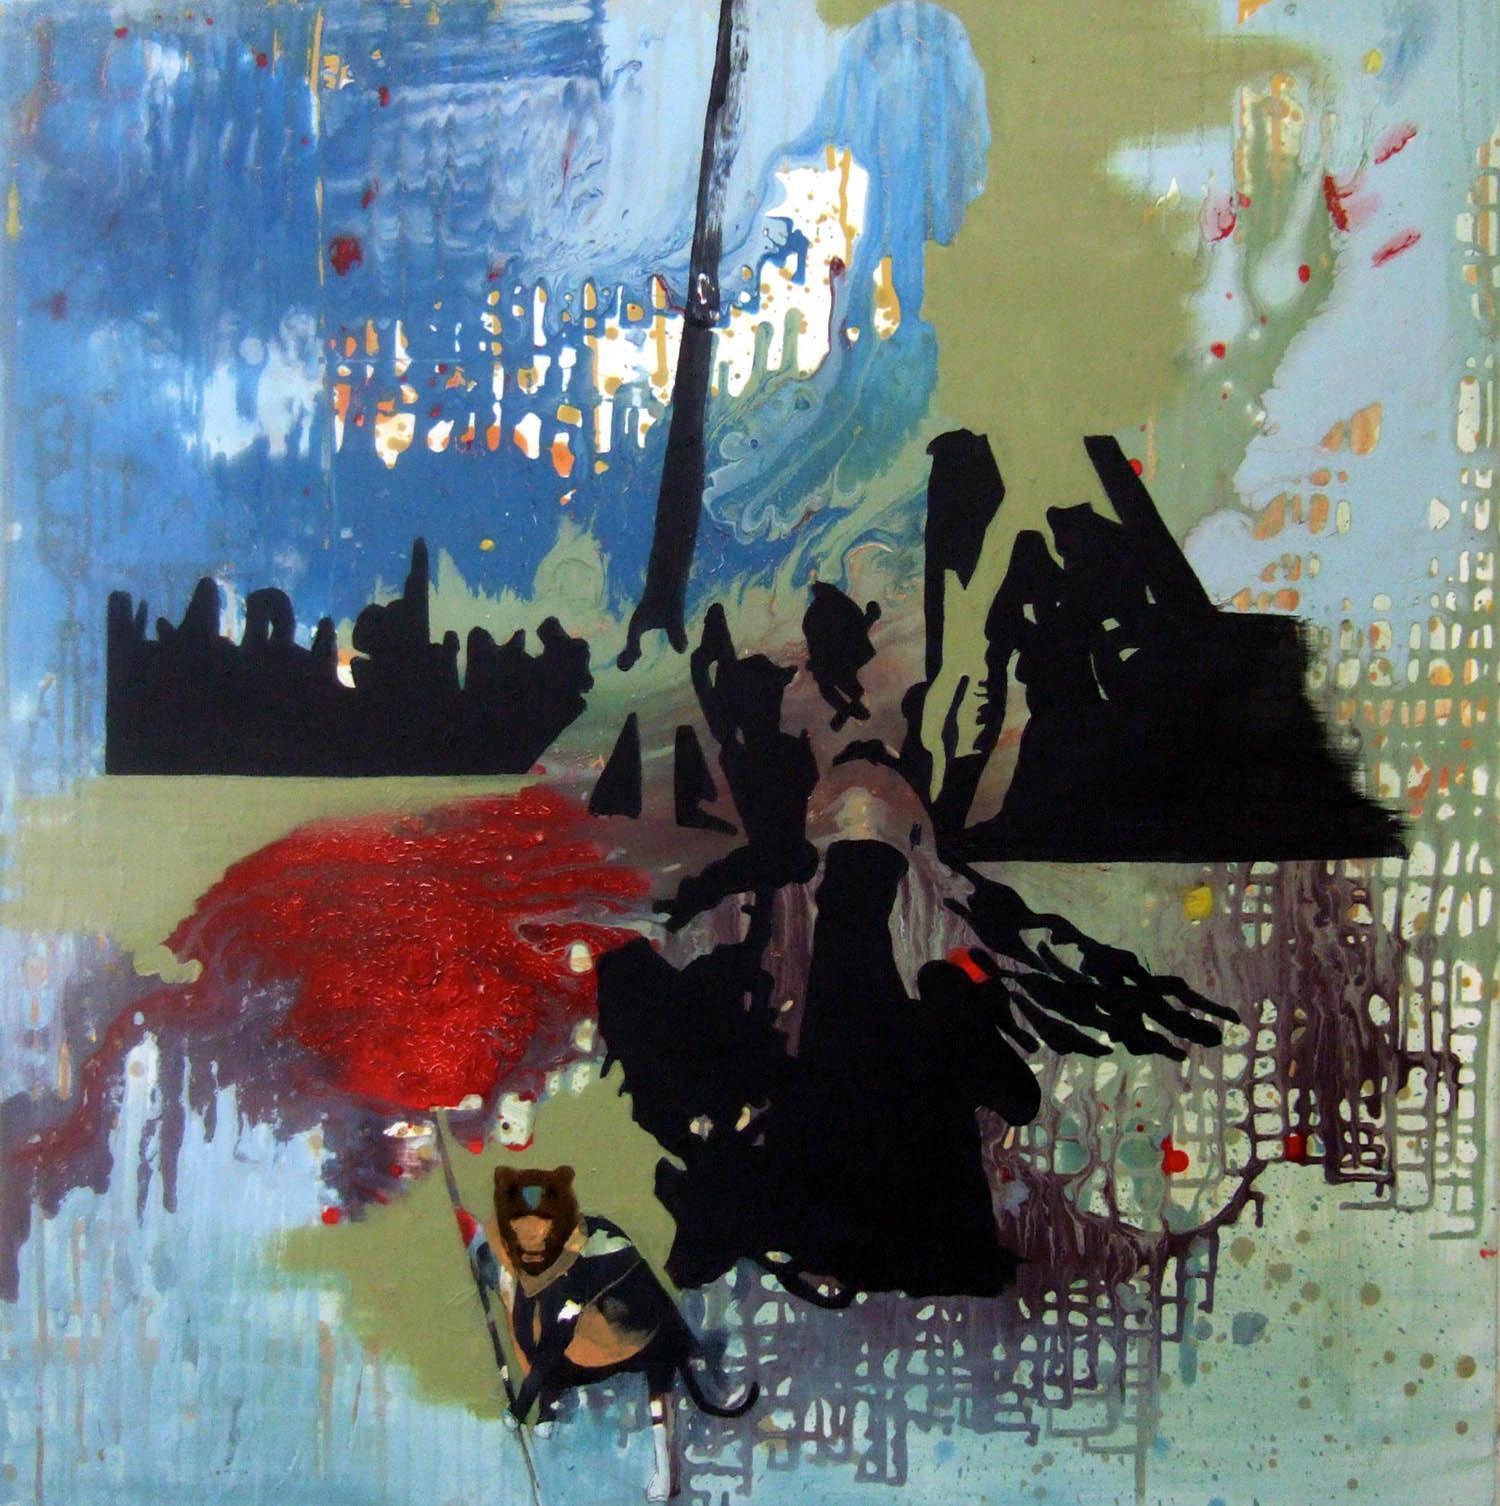 Monkey Girl (2006), acrylic and oil on canvas, 100 x 100cm